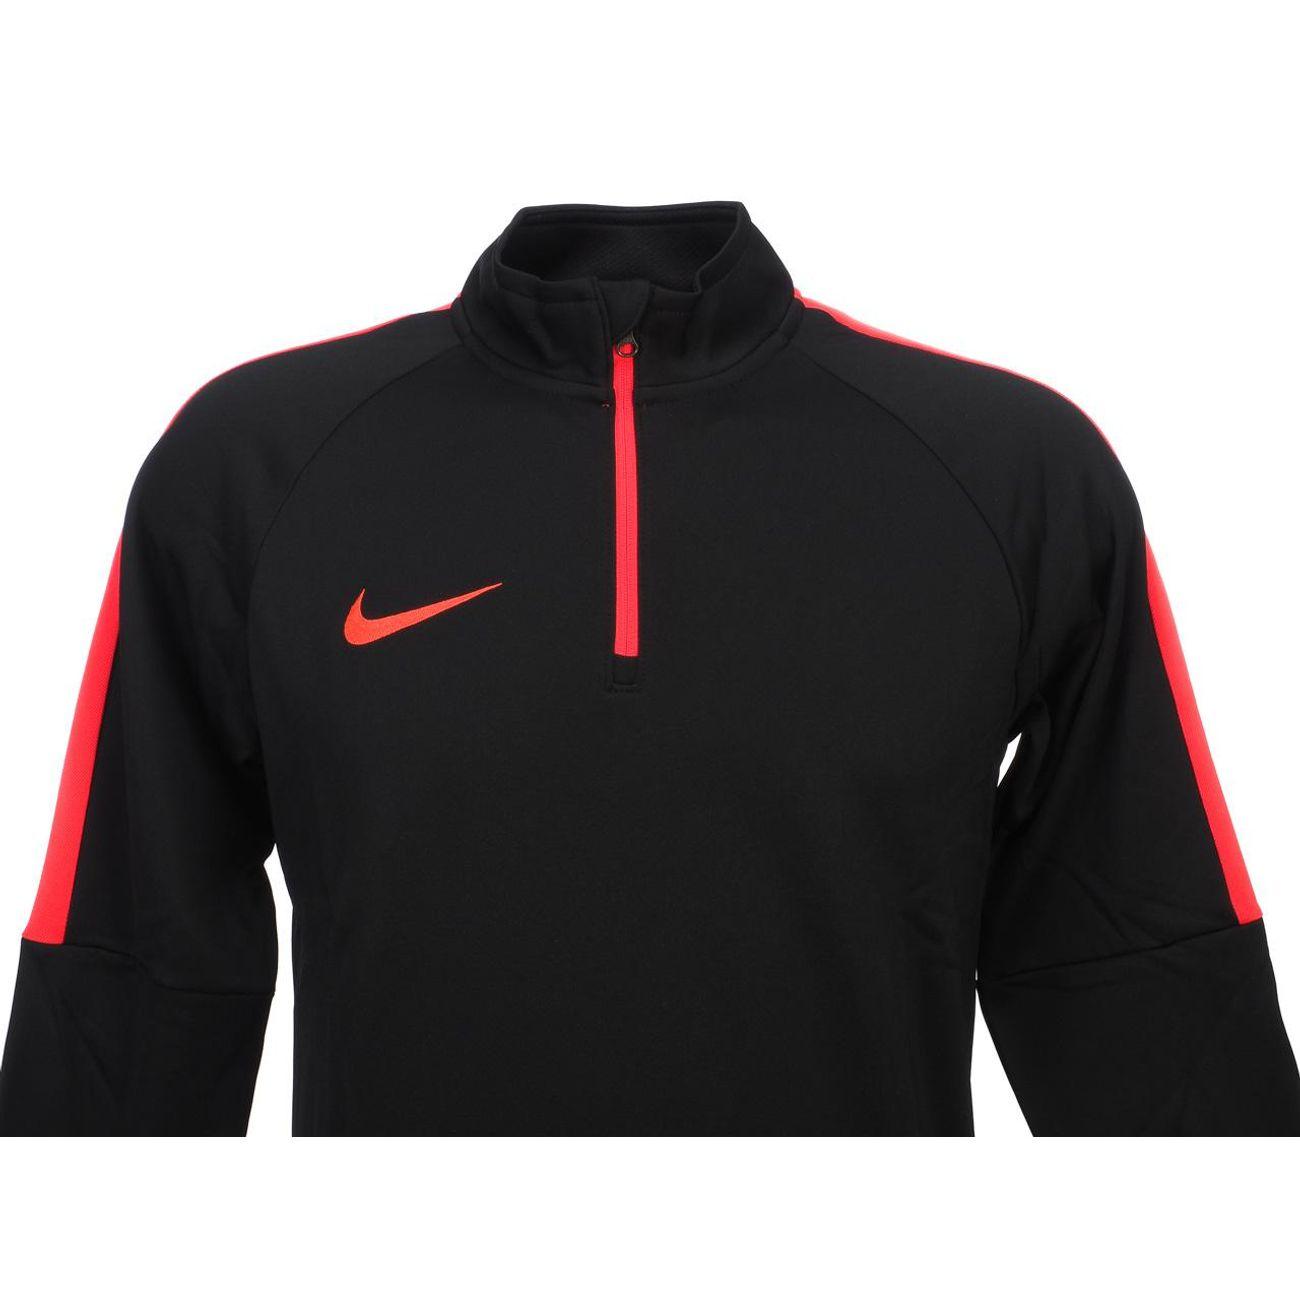 Football Nike Acdmy Homme Dril Dry Top UMpVqGzS